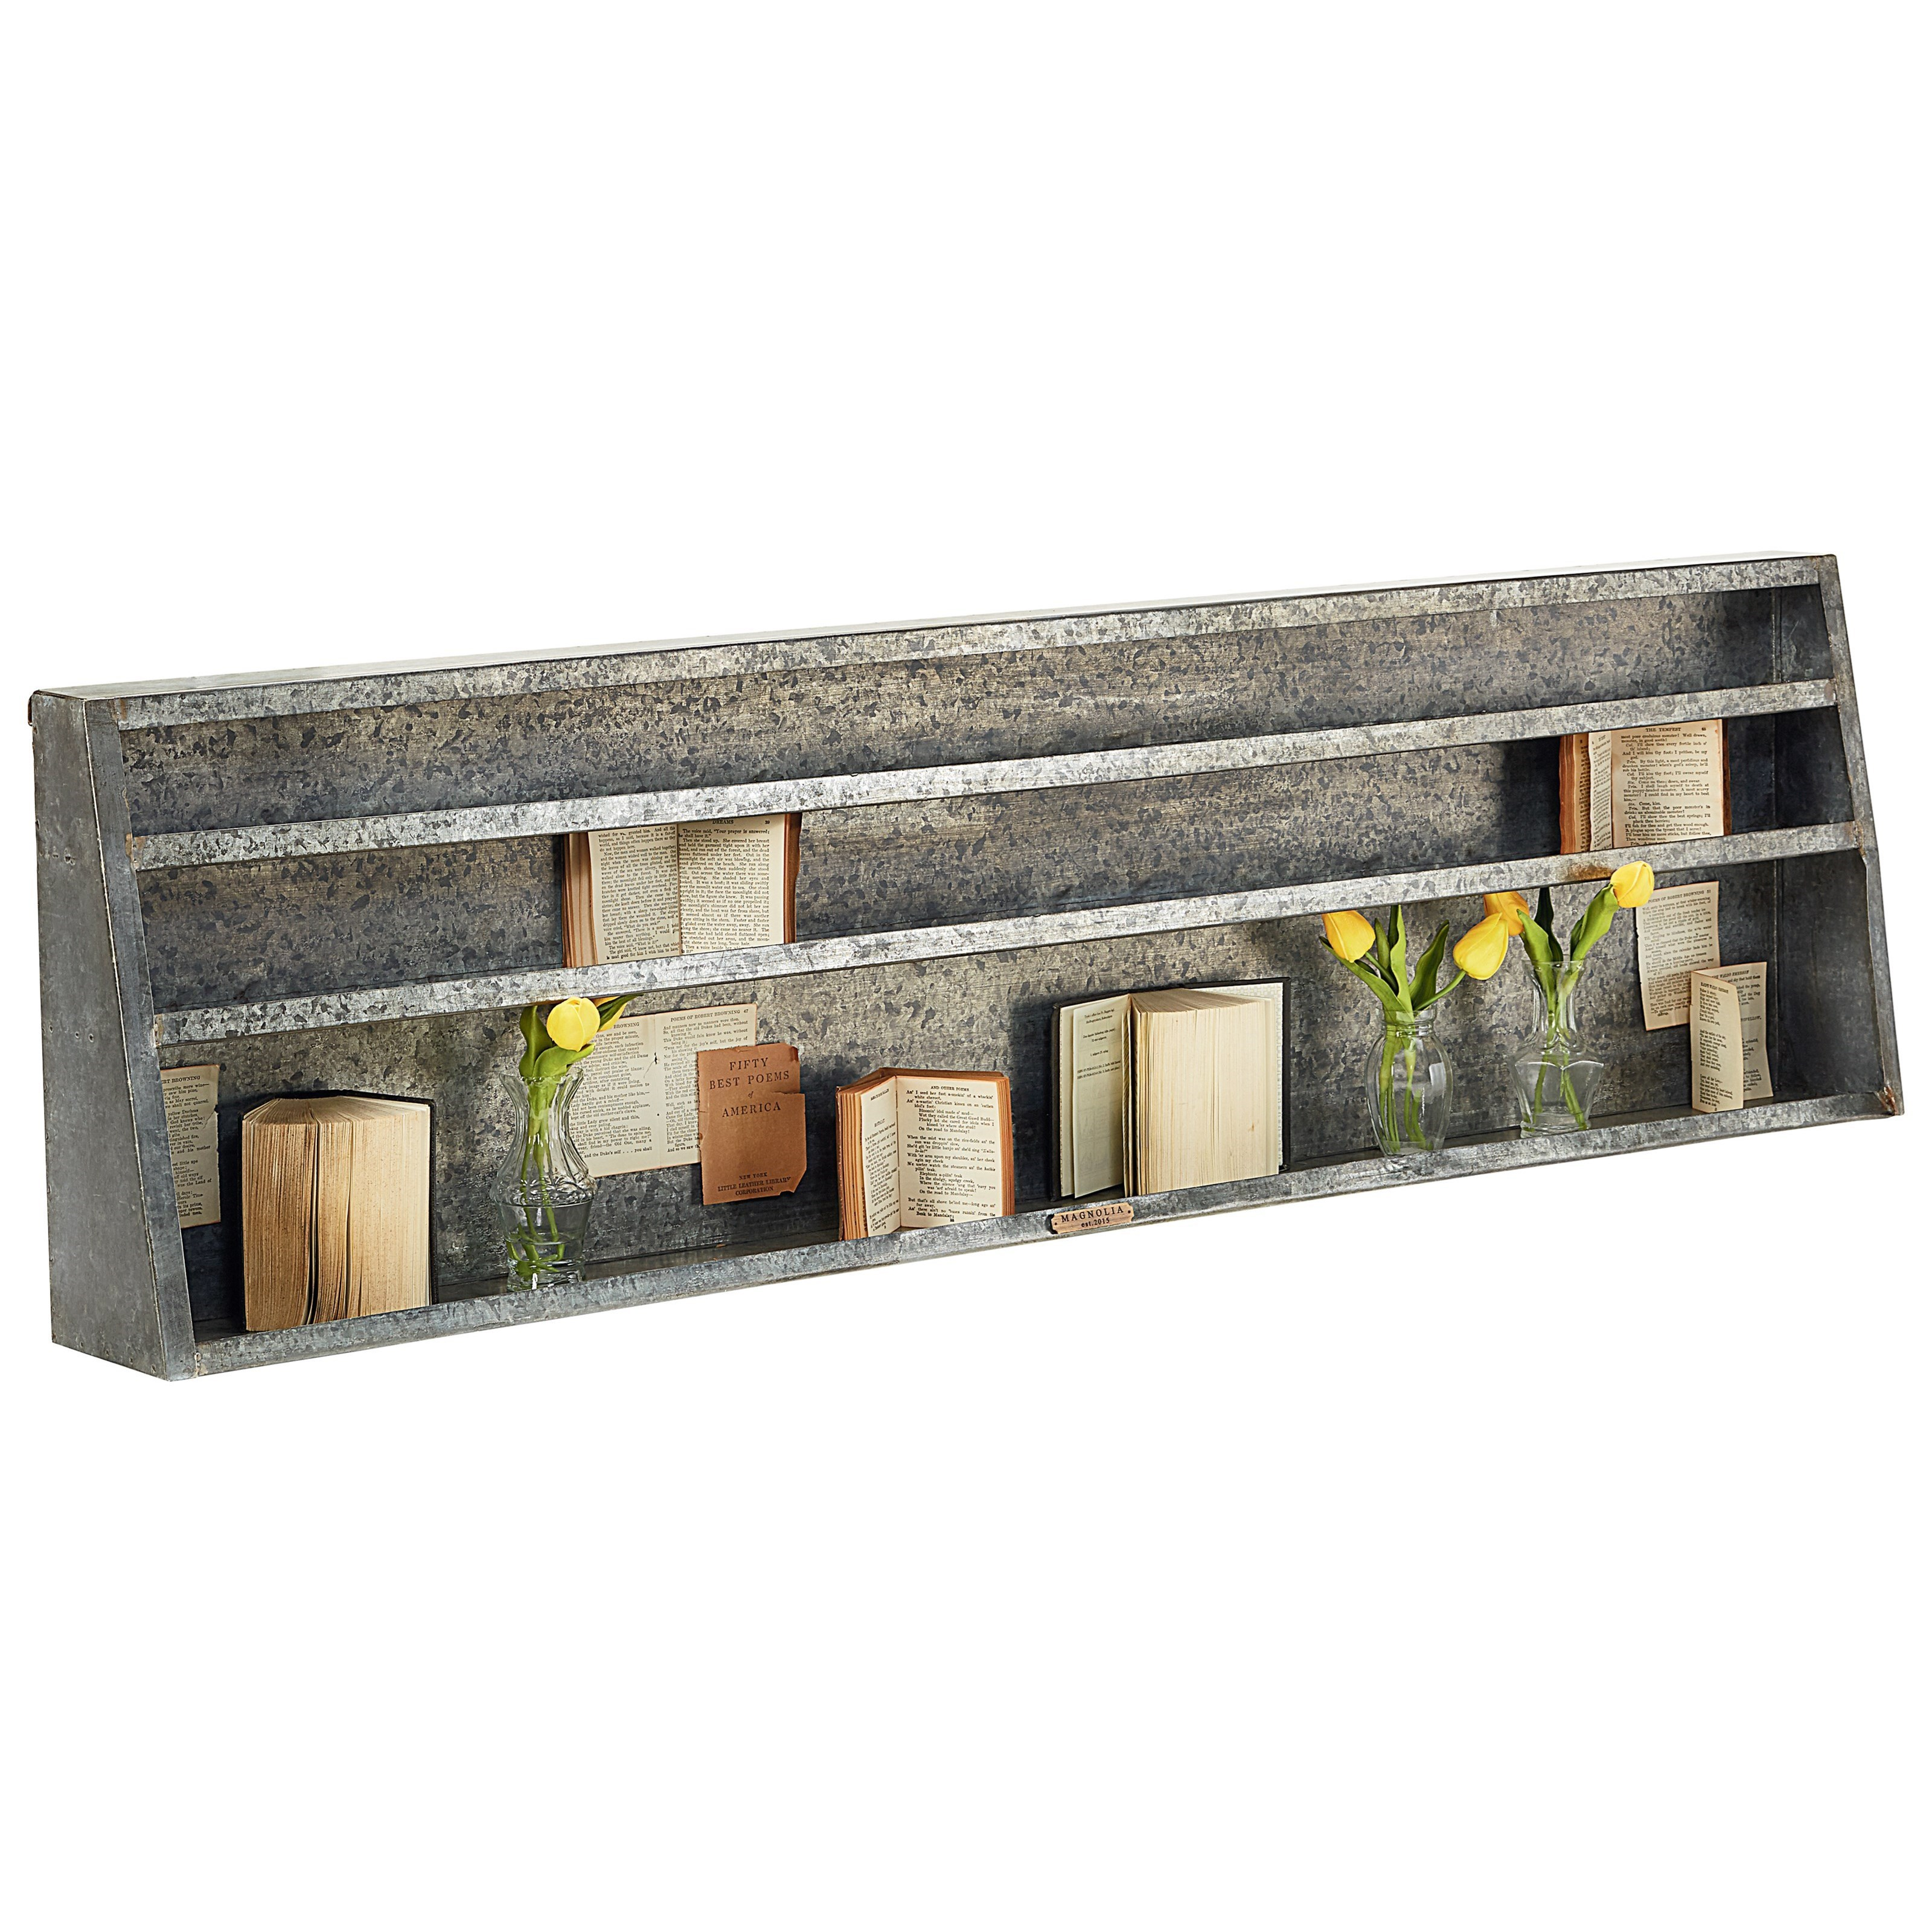 Fullsize Of Metal Wall Shelf